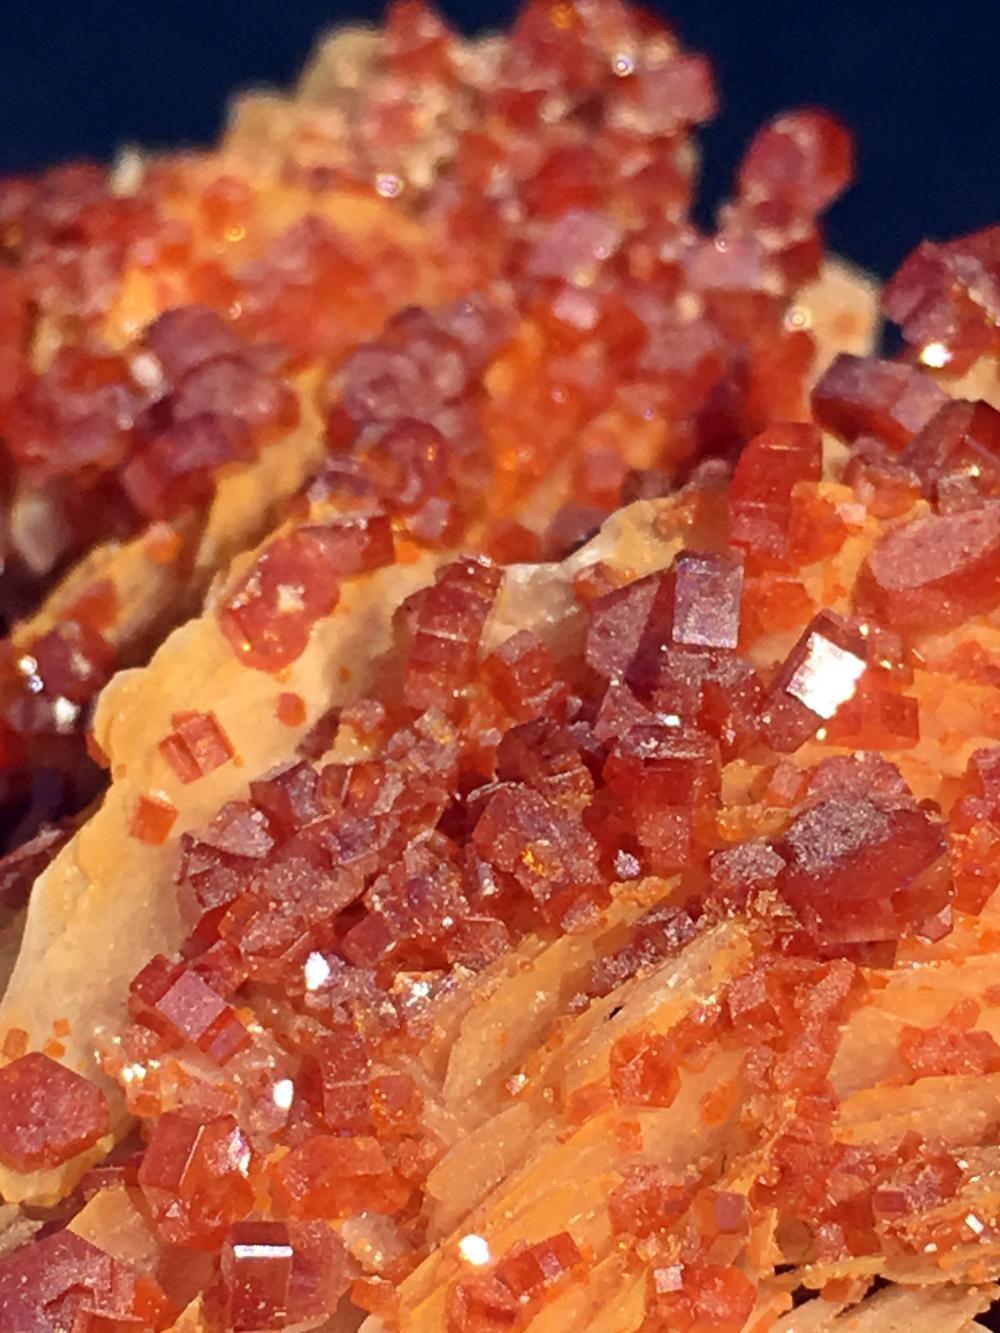 Lot 278: Vanadanite, Barite, Rock, Crystal, Natural, Collectible, Mineral, Specimen